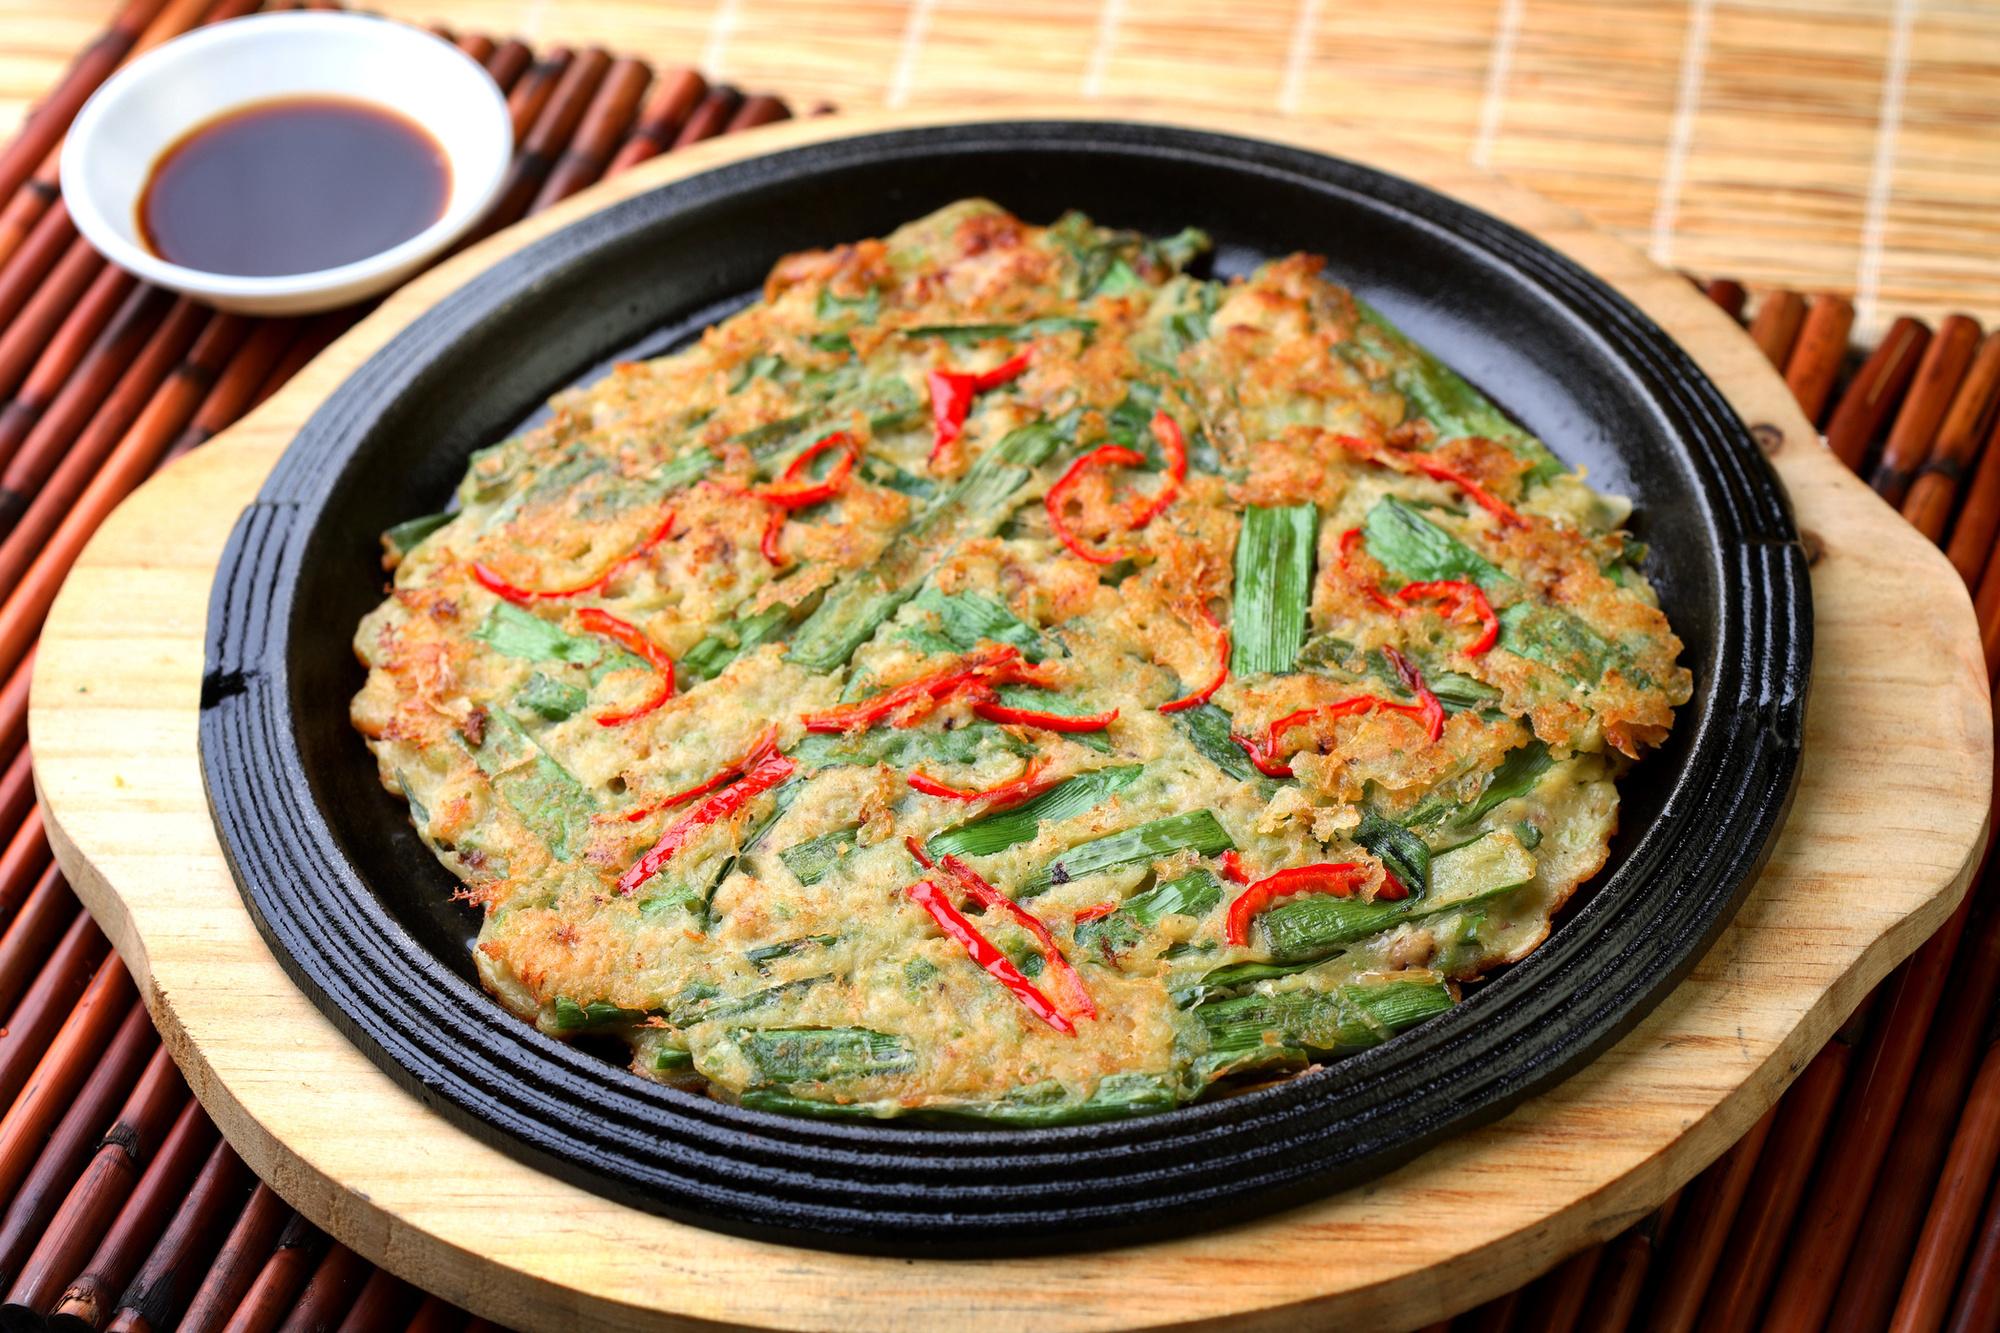 Yachaejeon - pancake coréen., iStock